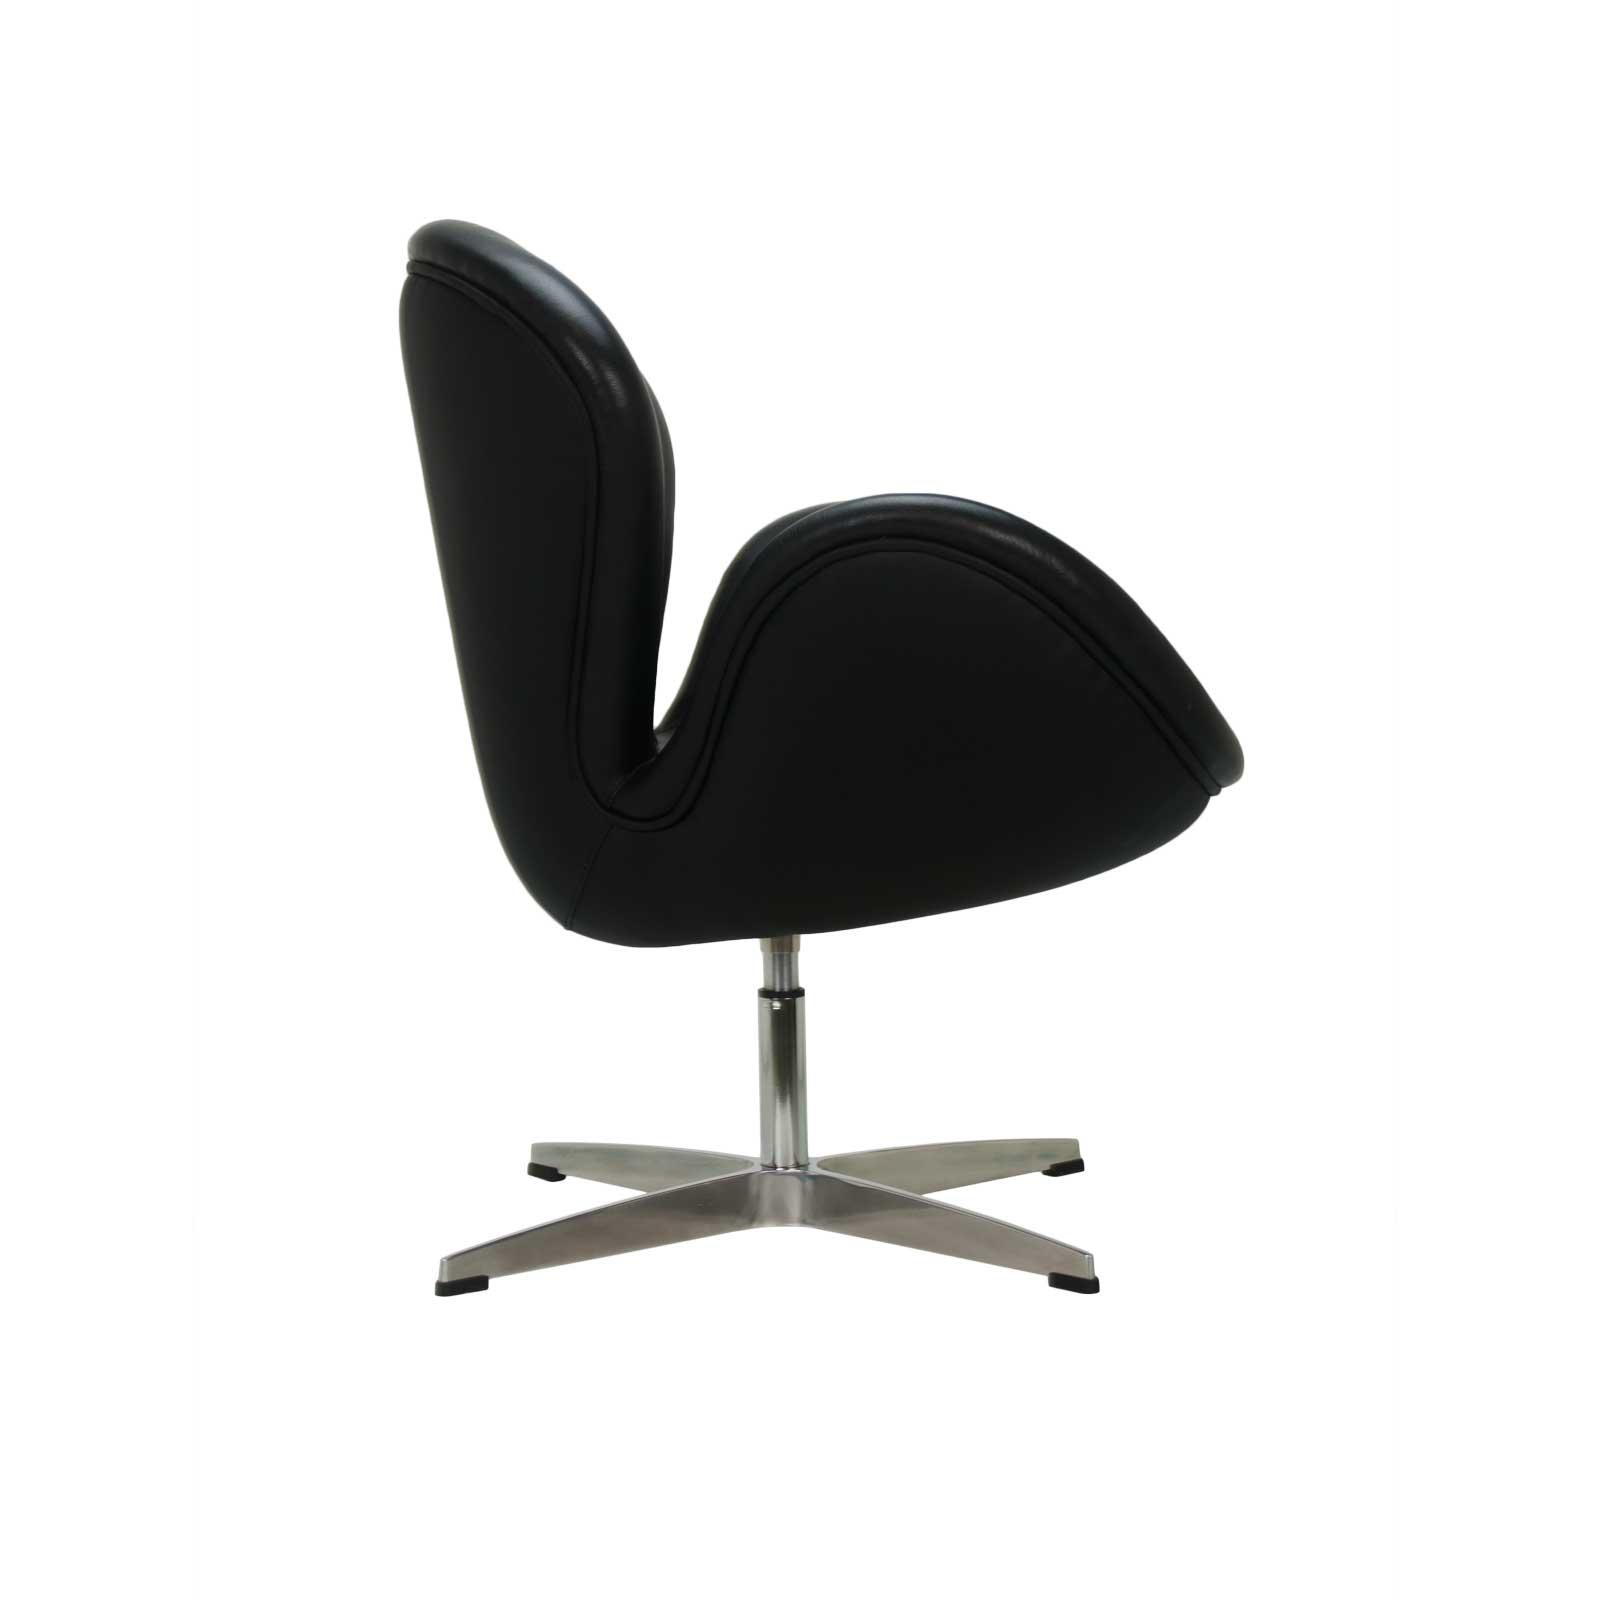 Awe Inspiring Arne Jacobsen Swan Chair Black Formdecor Evergreenethics Interior Chair Design Evergreenethicsorg